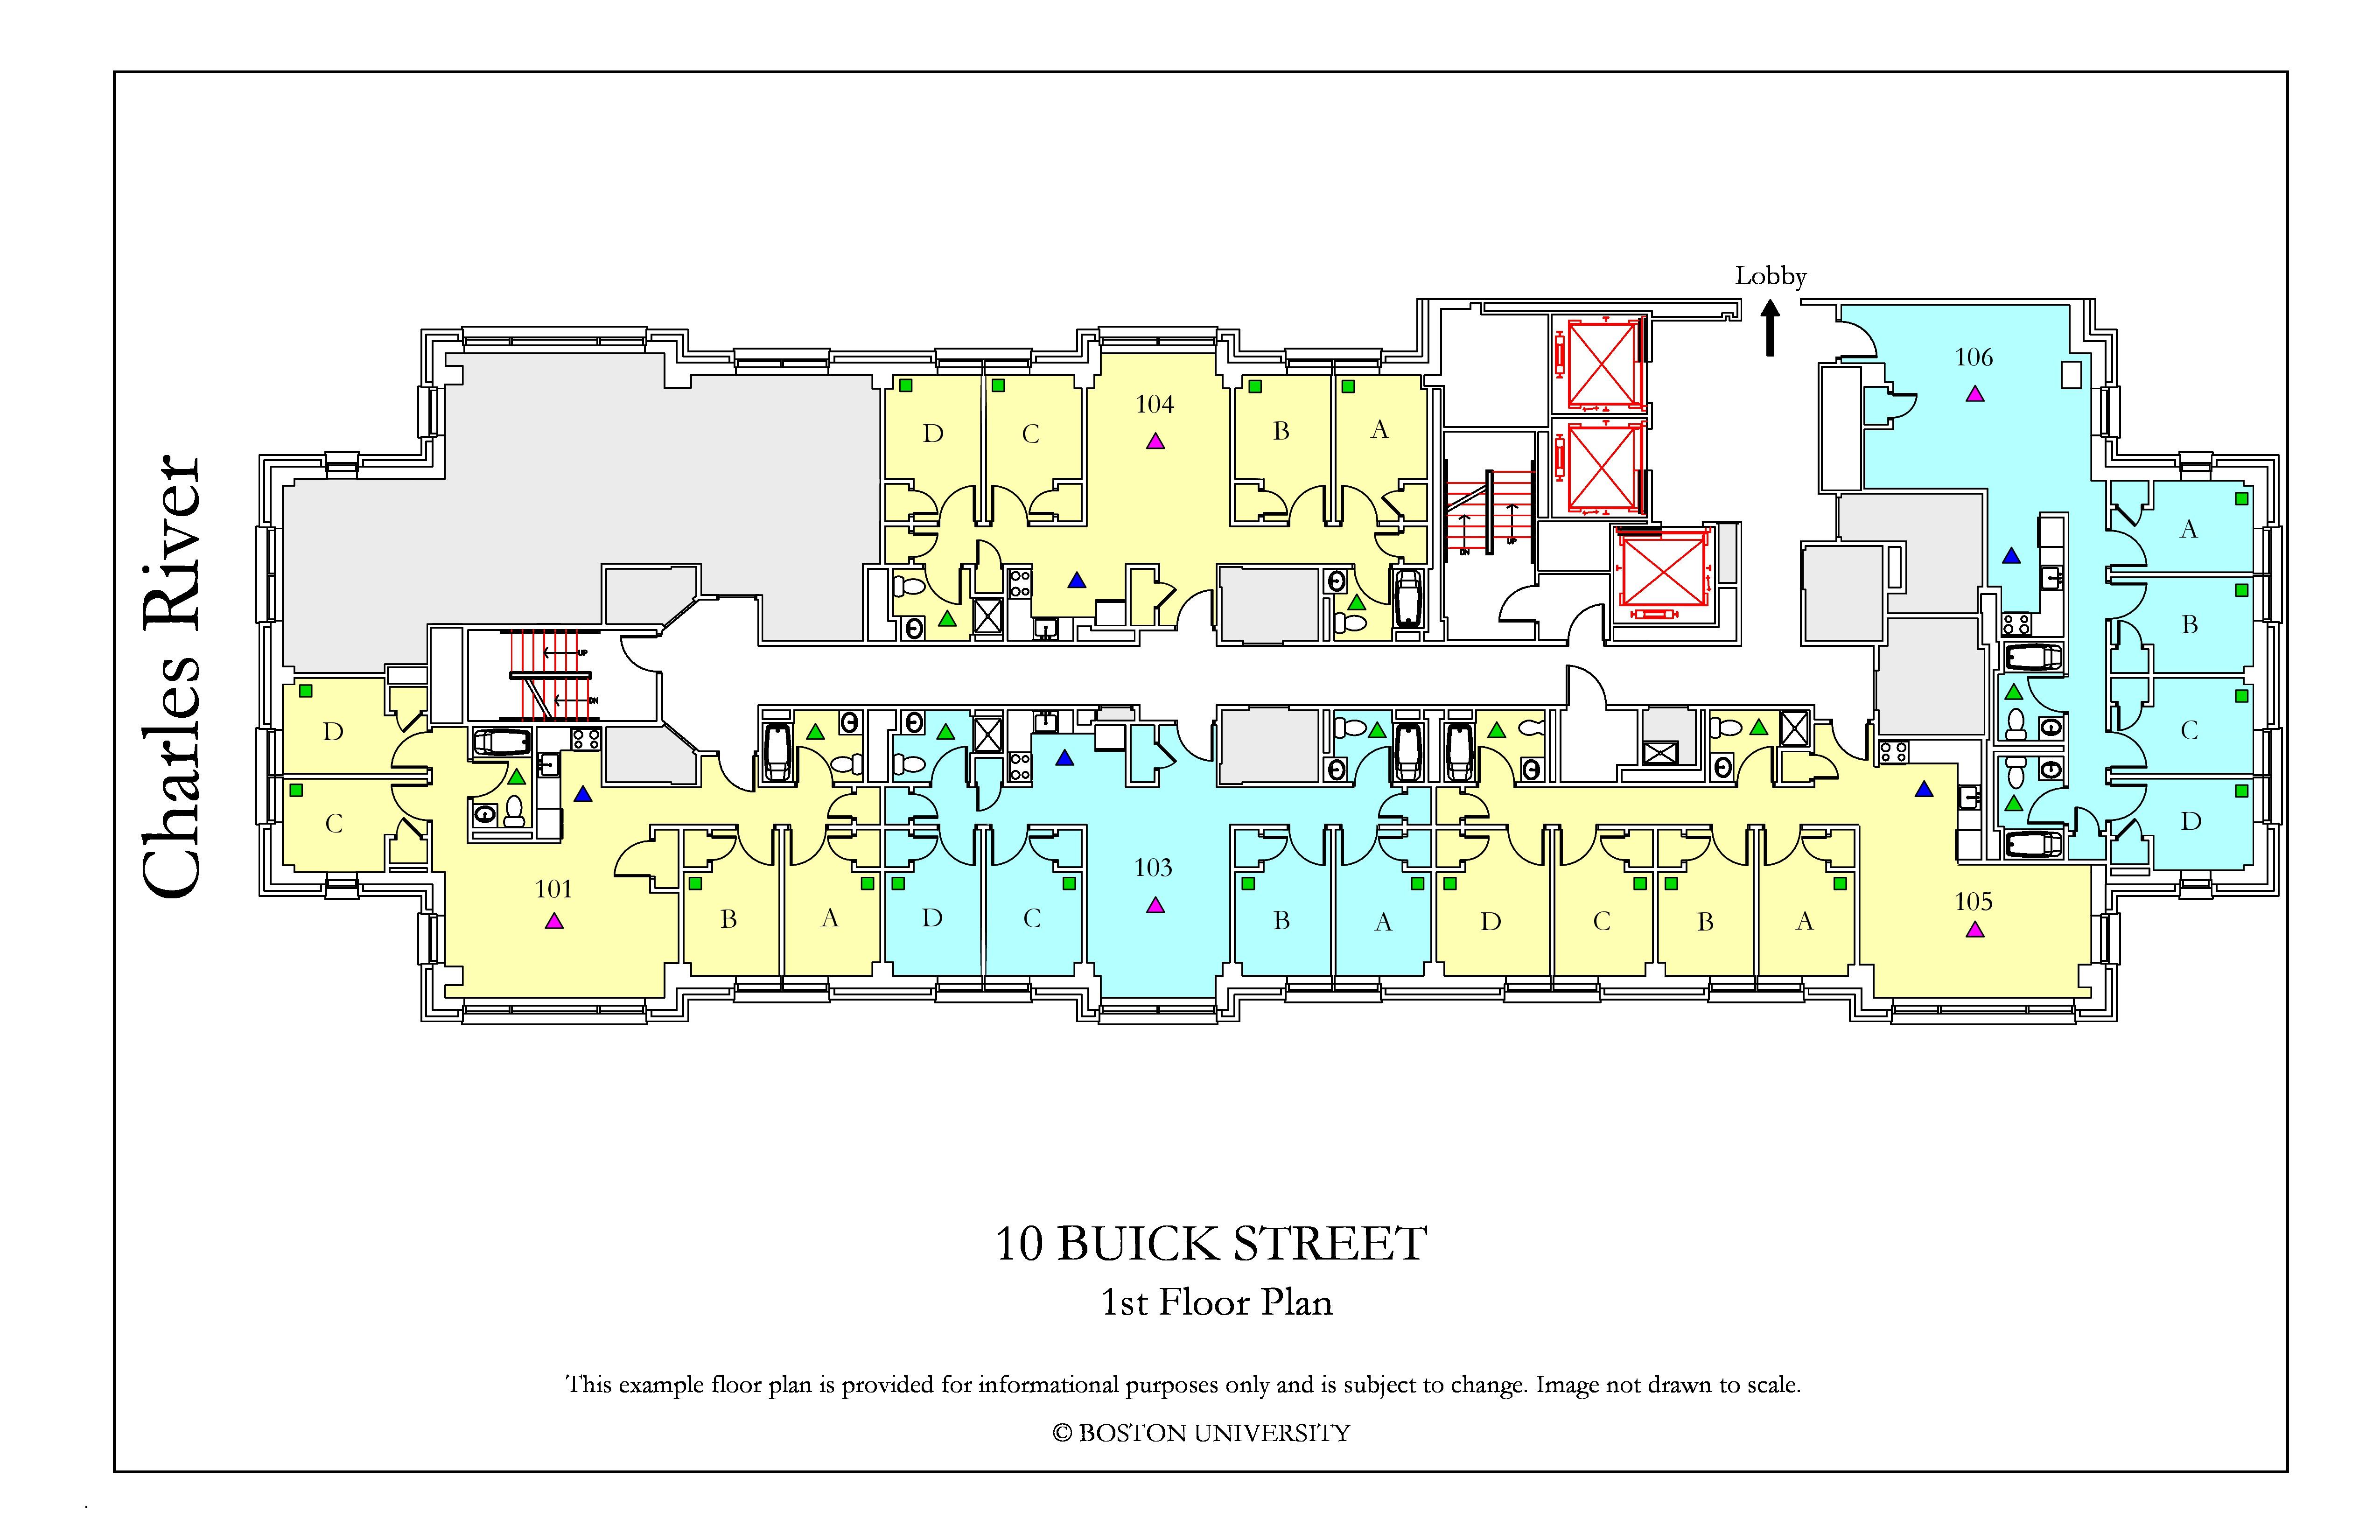 10 Buick Floor Plan  Housing  Boston University